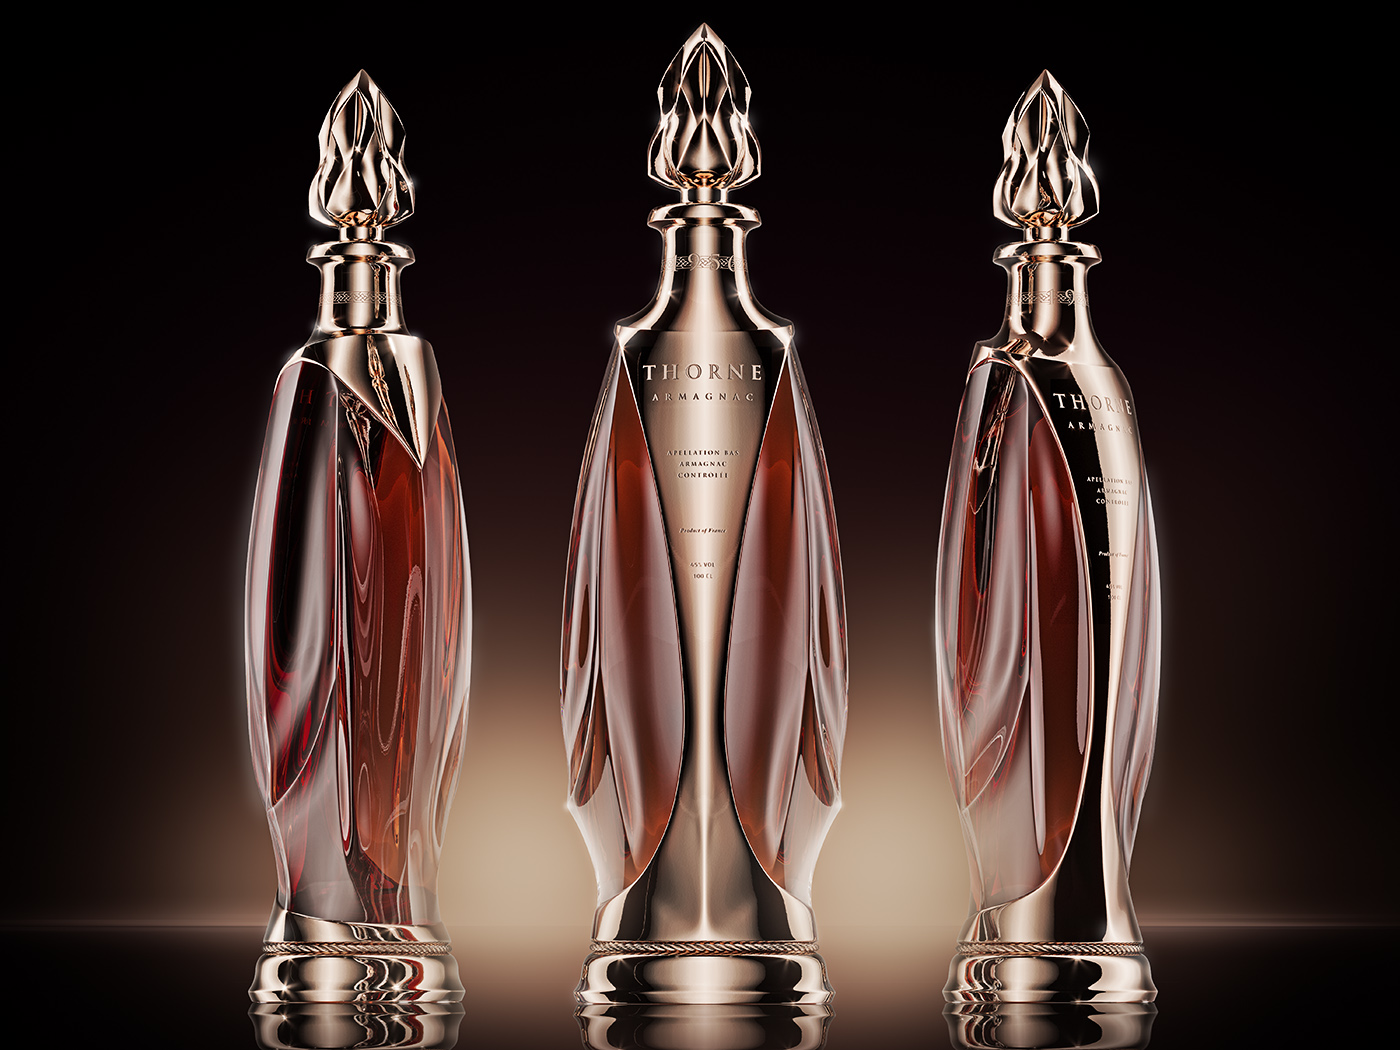 Thorne luxury armagnac bottle 1.jpg